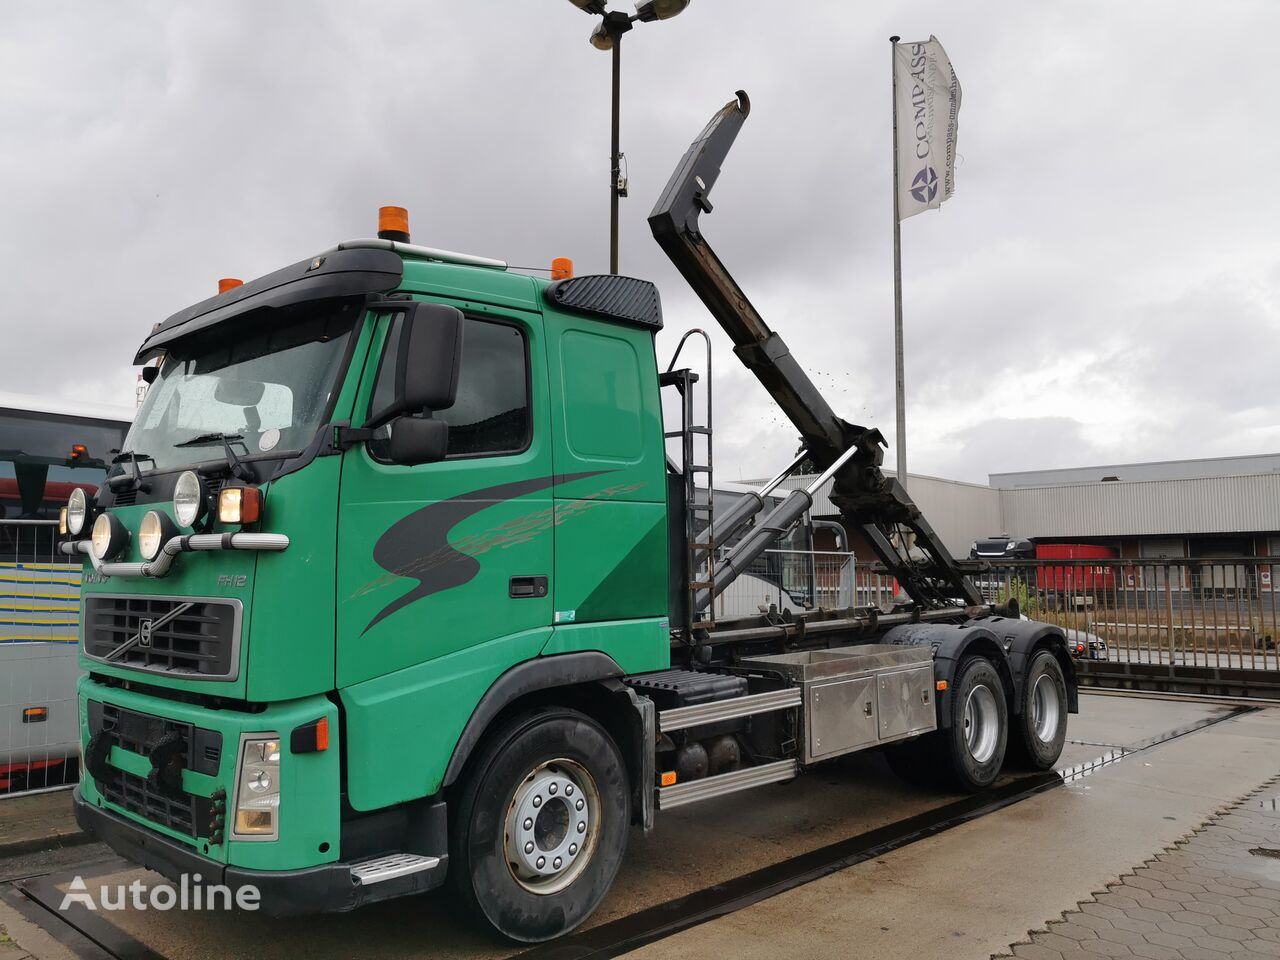 VOLVO FH12 6X4 420HP, Manual Gearbox, HIAB Multilift LHS26153 FHJO-R 2 kamion rol kiper